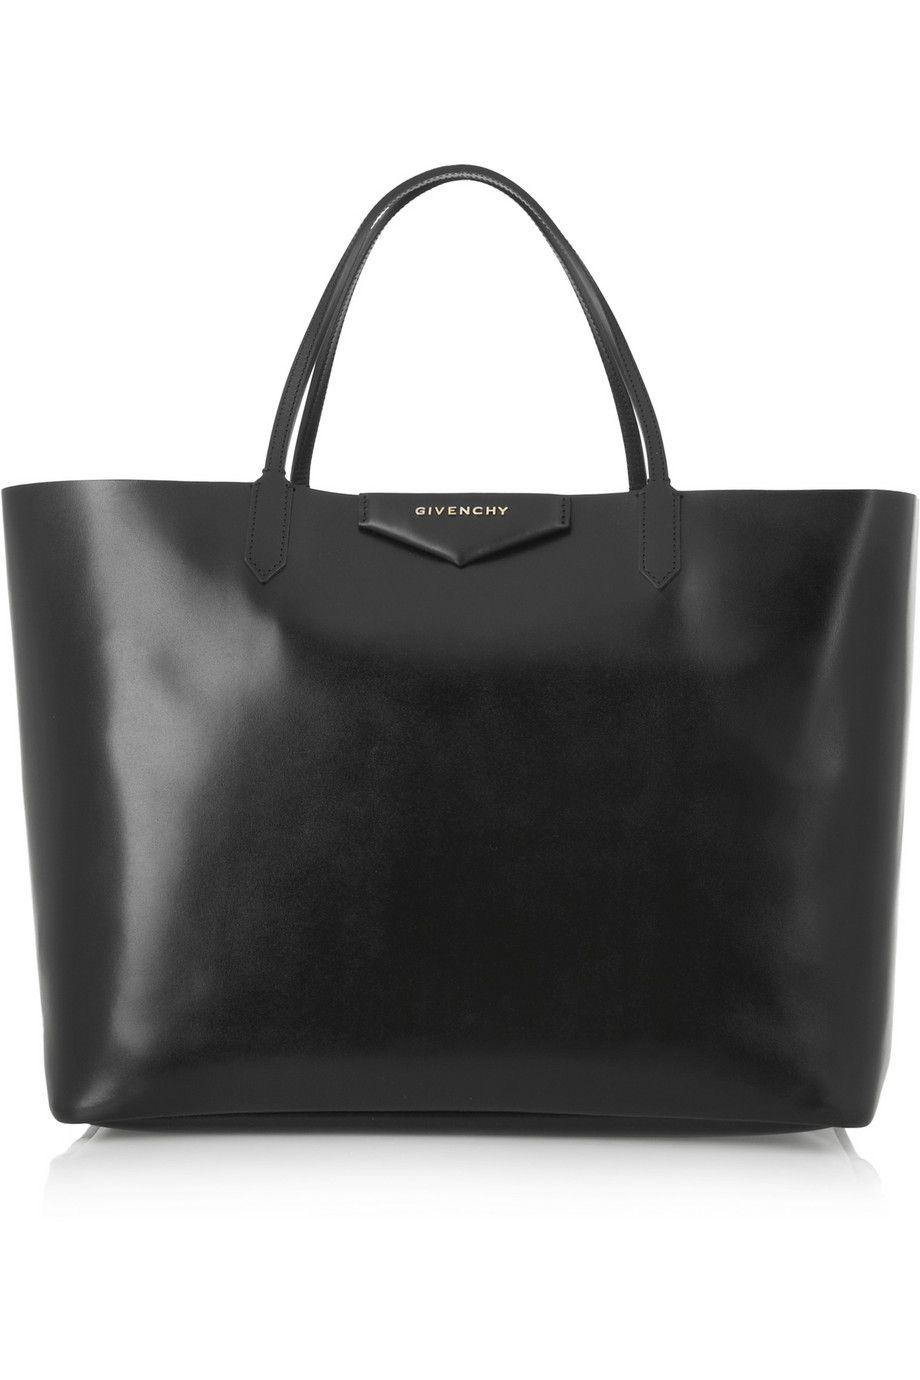 Givenchy | Antigona shopping bag in leather | NET-A-PORTER.COM